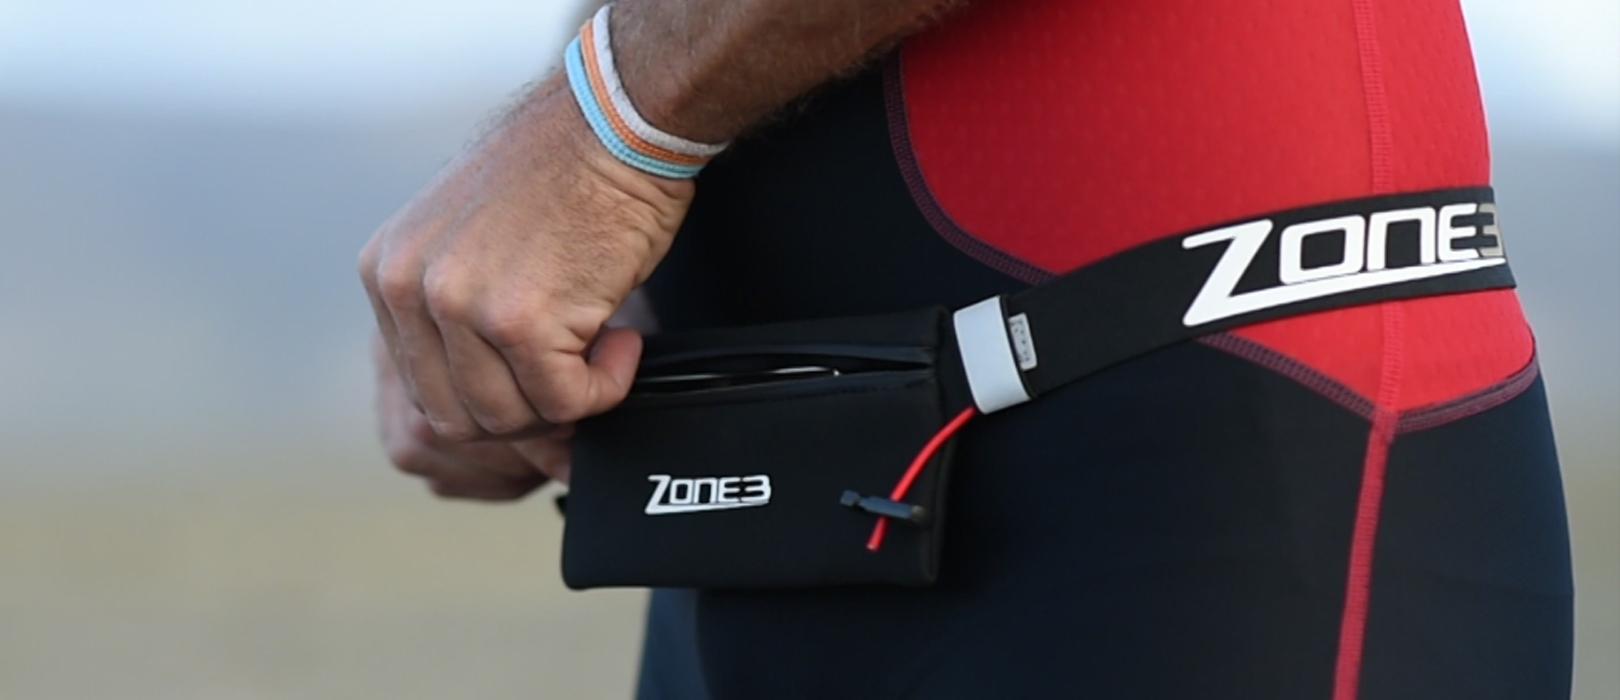 Neoprene Pouch Belt - Lifestyle (3)